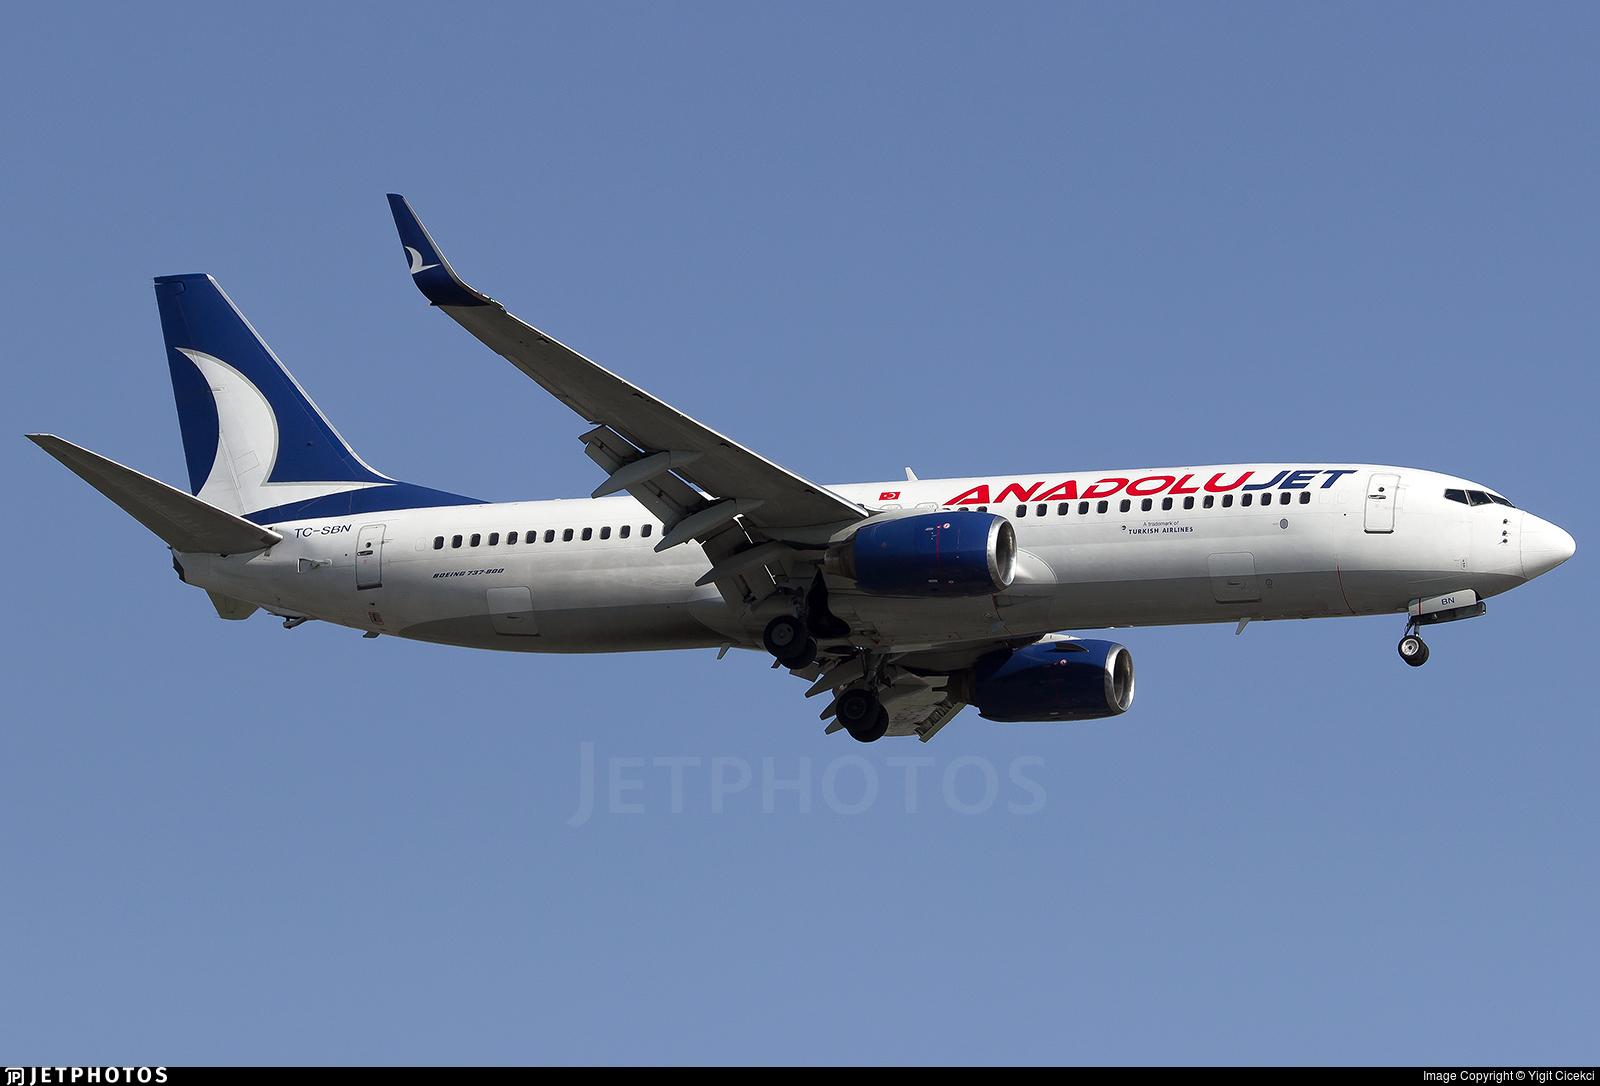 TC-SBN - Boeing 737-86N - AnadoluJet